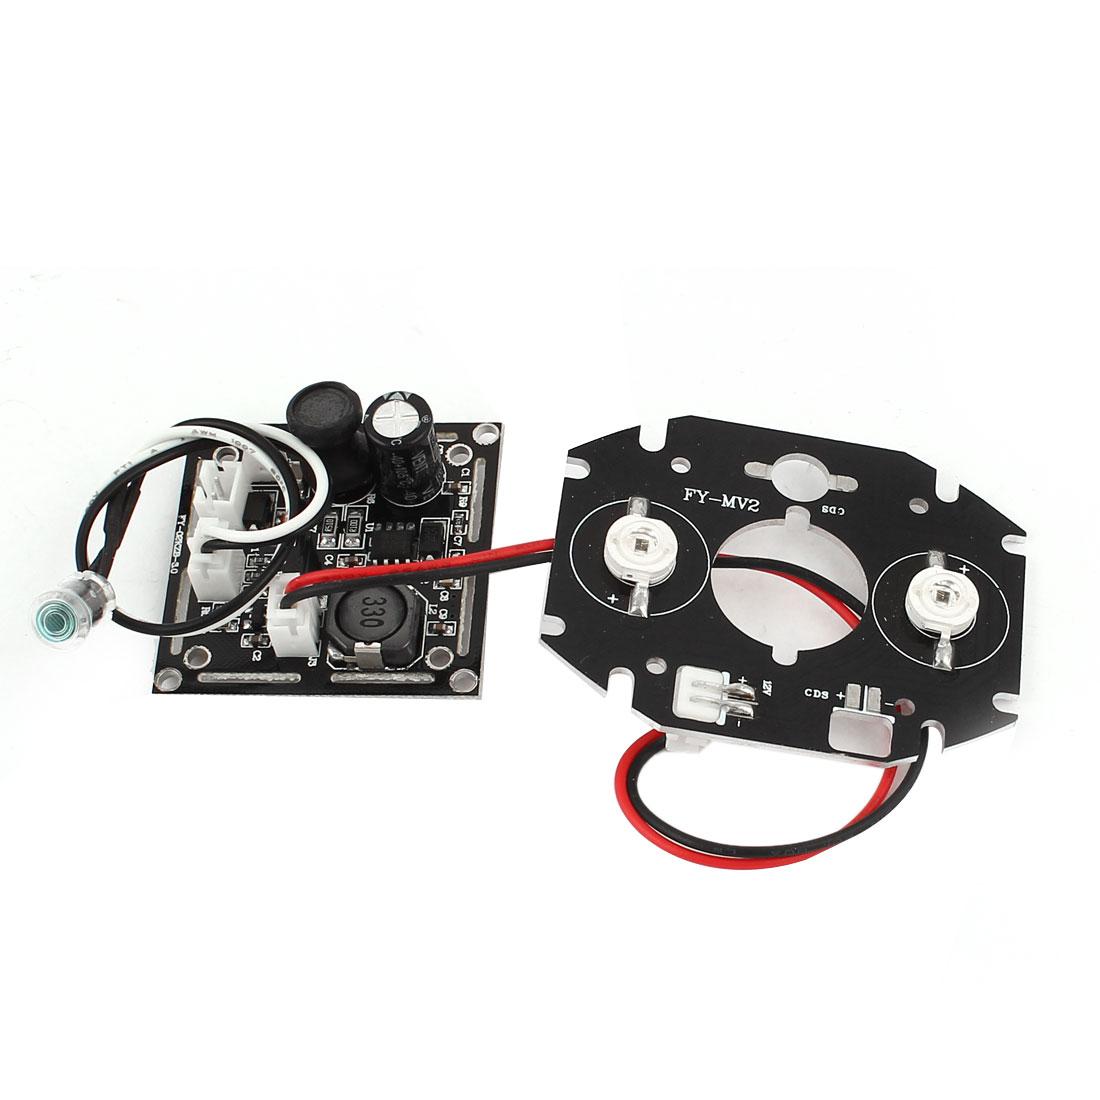 54mmx43mm 42mil 2 Array 2 LED IR Illuminator Bulb Board for CCTV Security Camera